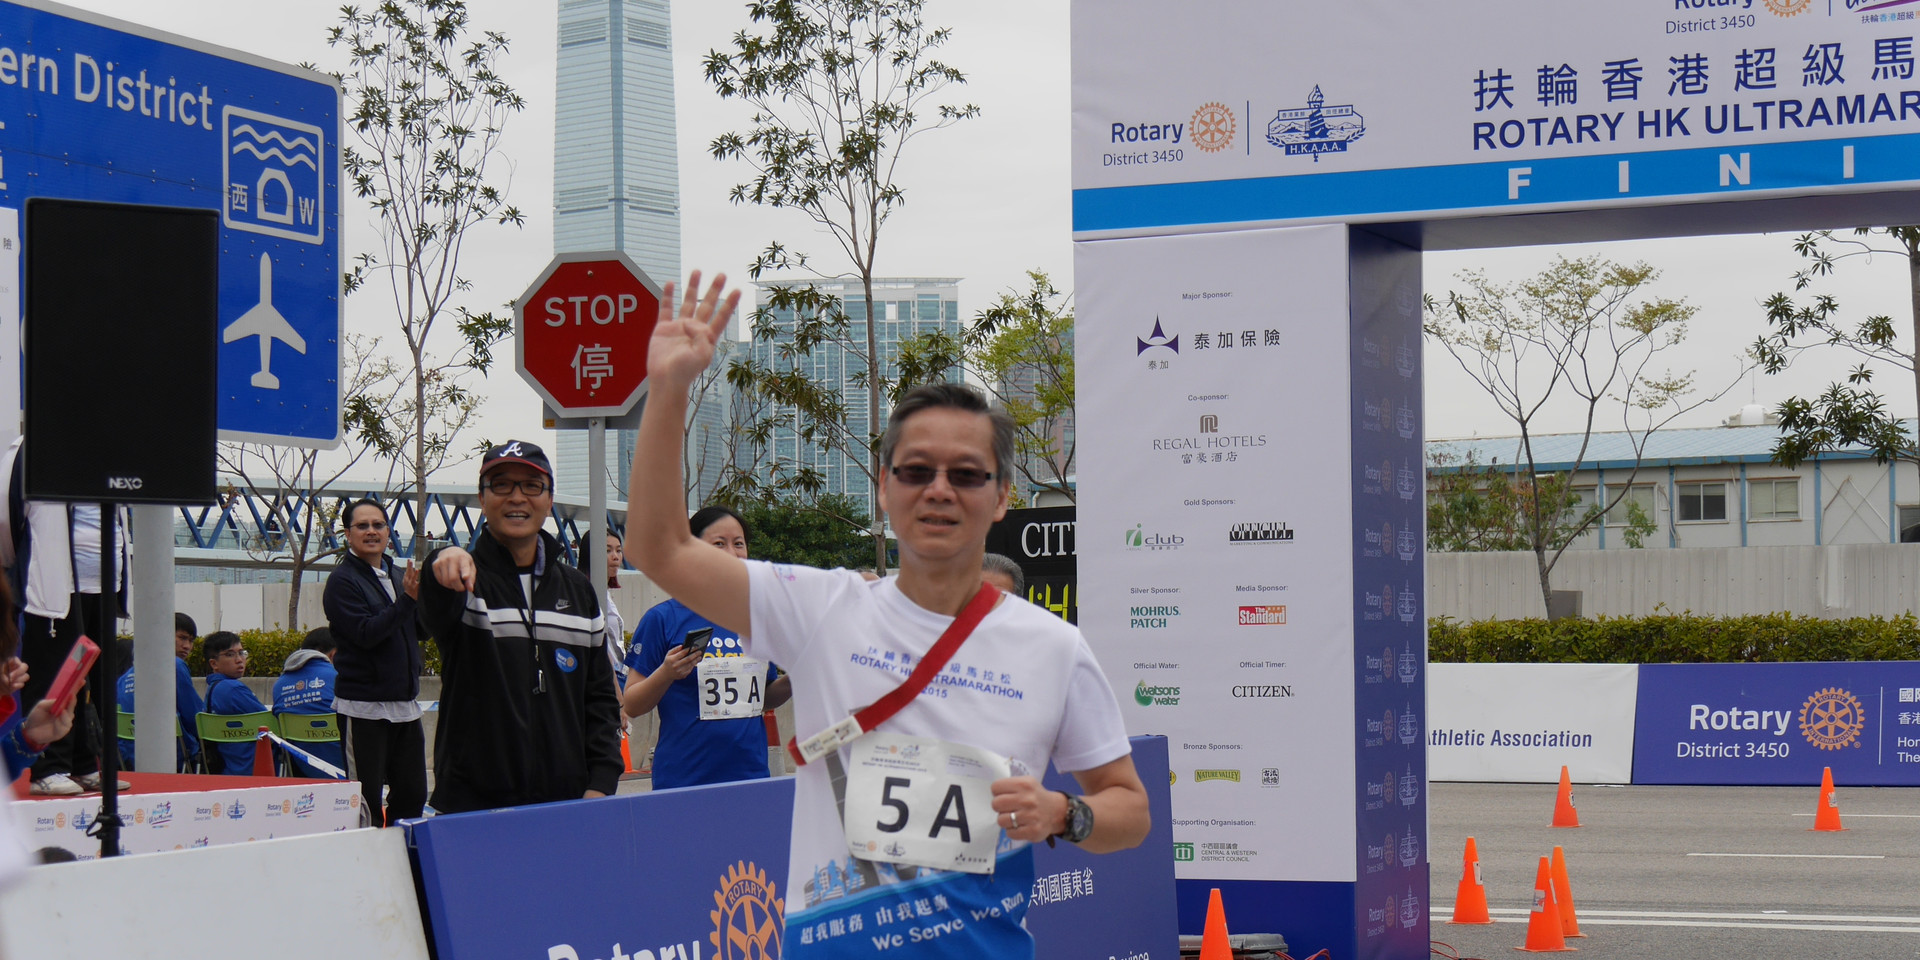 Ultramarathon _ Rotary Carnival 160.JPG